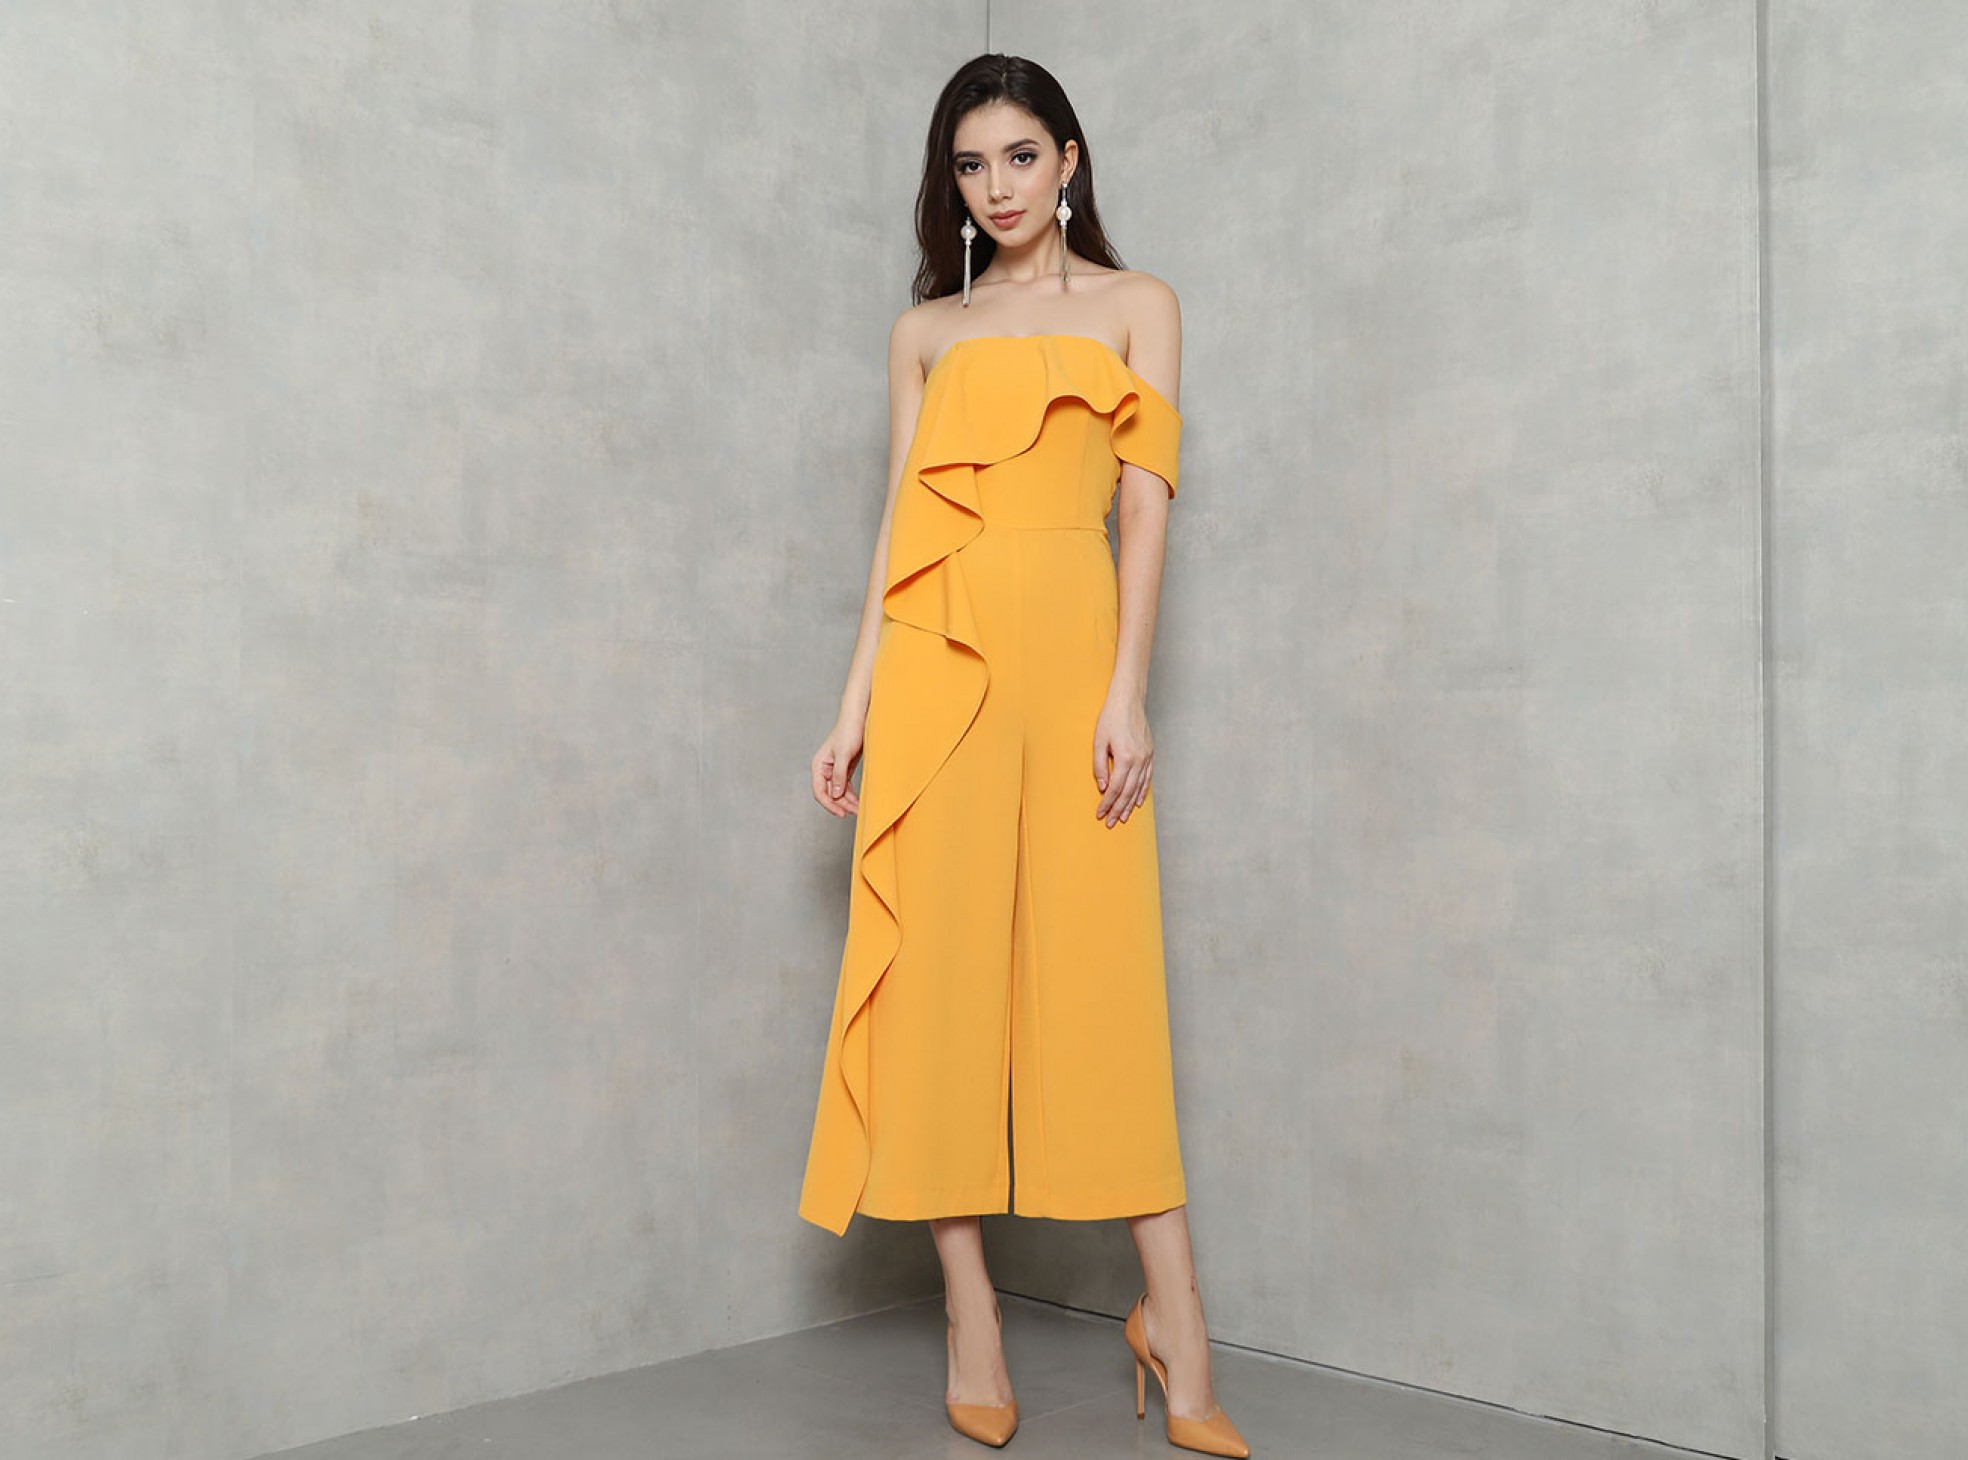 BARDOT CULOTTE JUMPSUIT IN ORANGE   MAISION.COM : Fashion